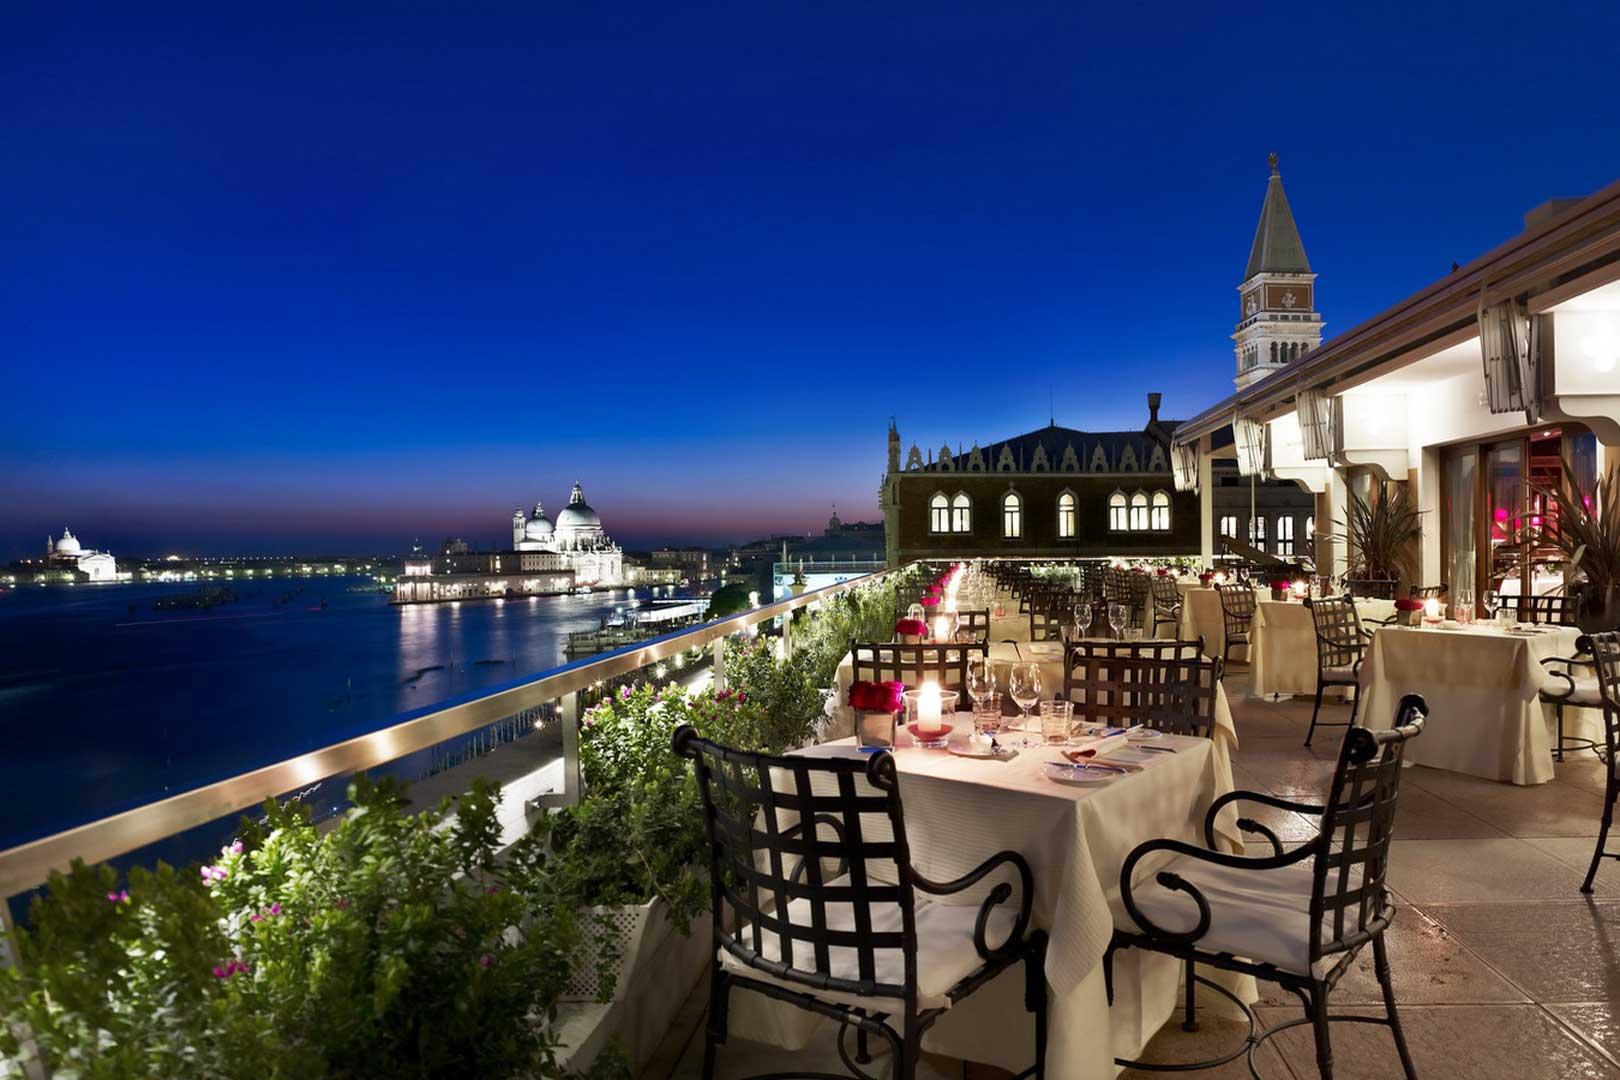 Hotel Danieli - Terrazza